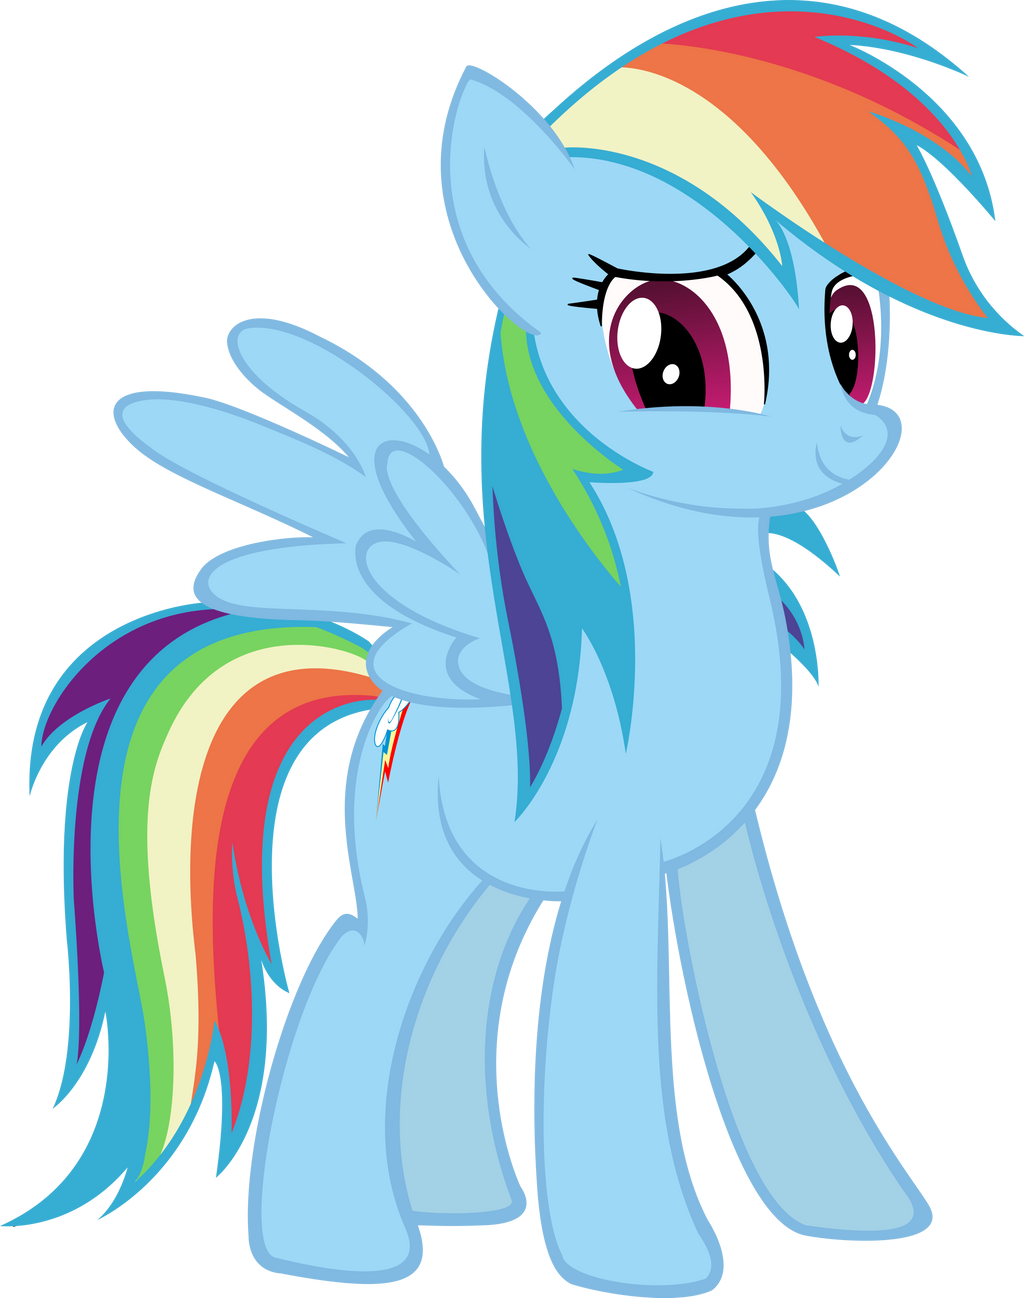 Rainbow Dash (Vector) by DatBrass